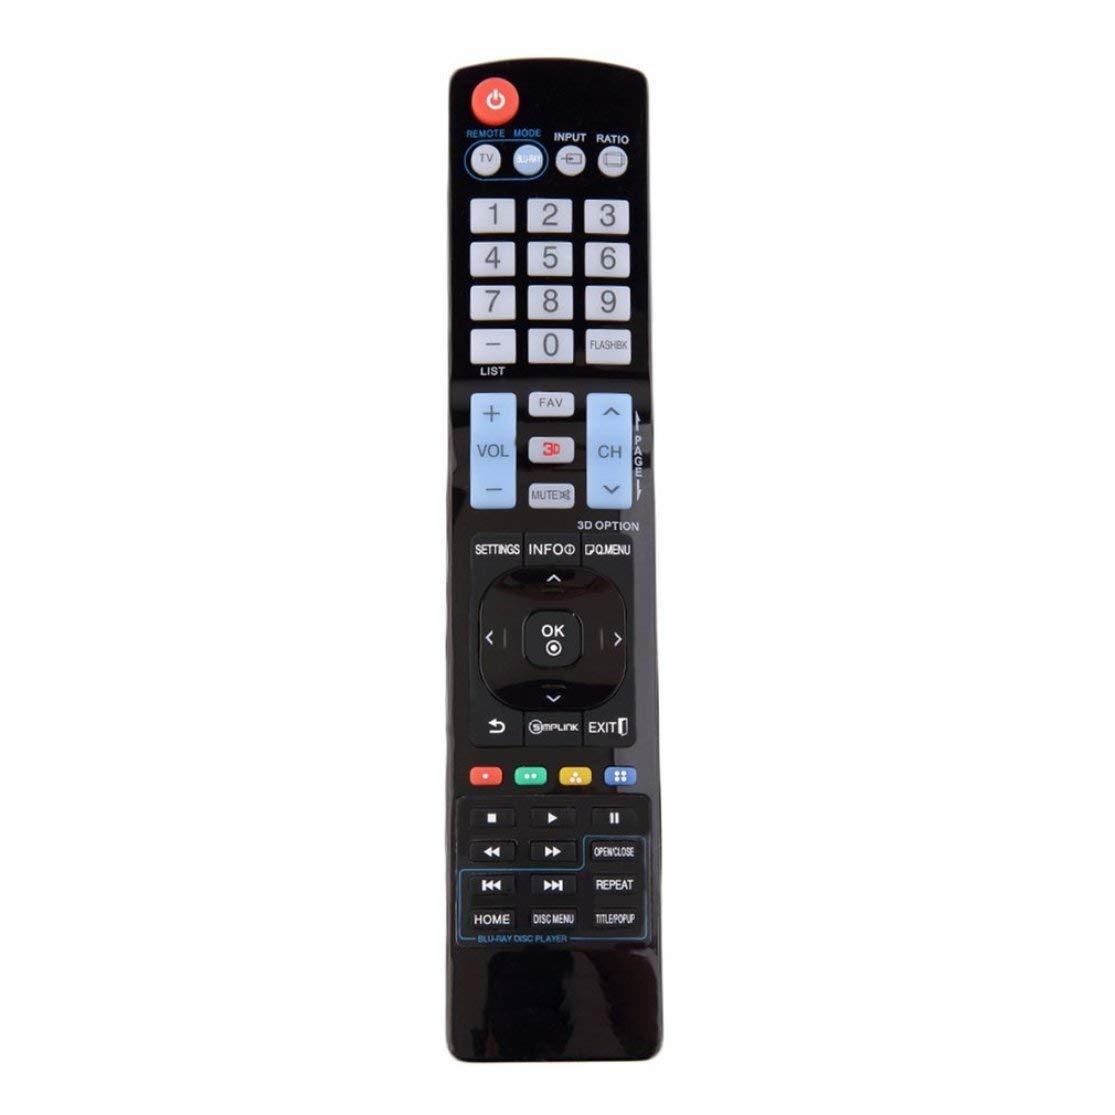 Reemplazo Universal de pl/ástico Negro Control Remoto No se Requiere programaci/ón para LG LCD LED HDTV 3D Smart TV